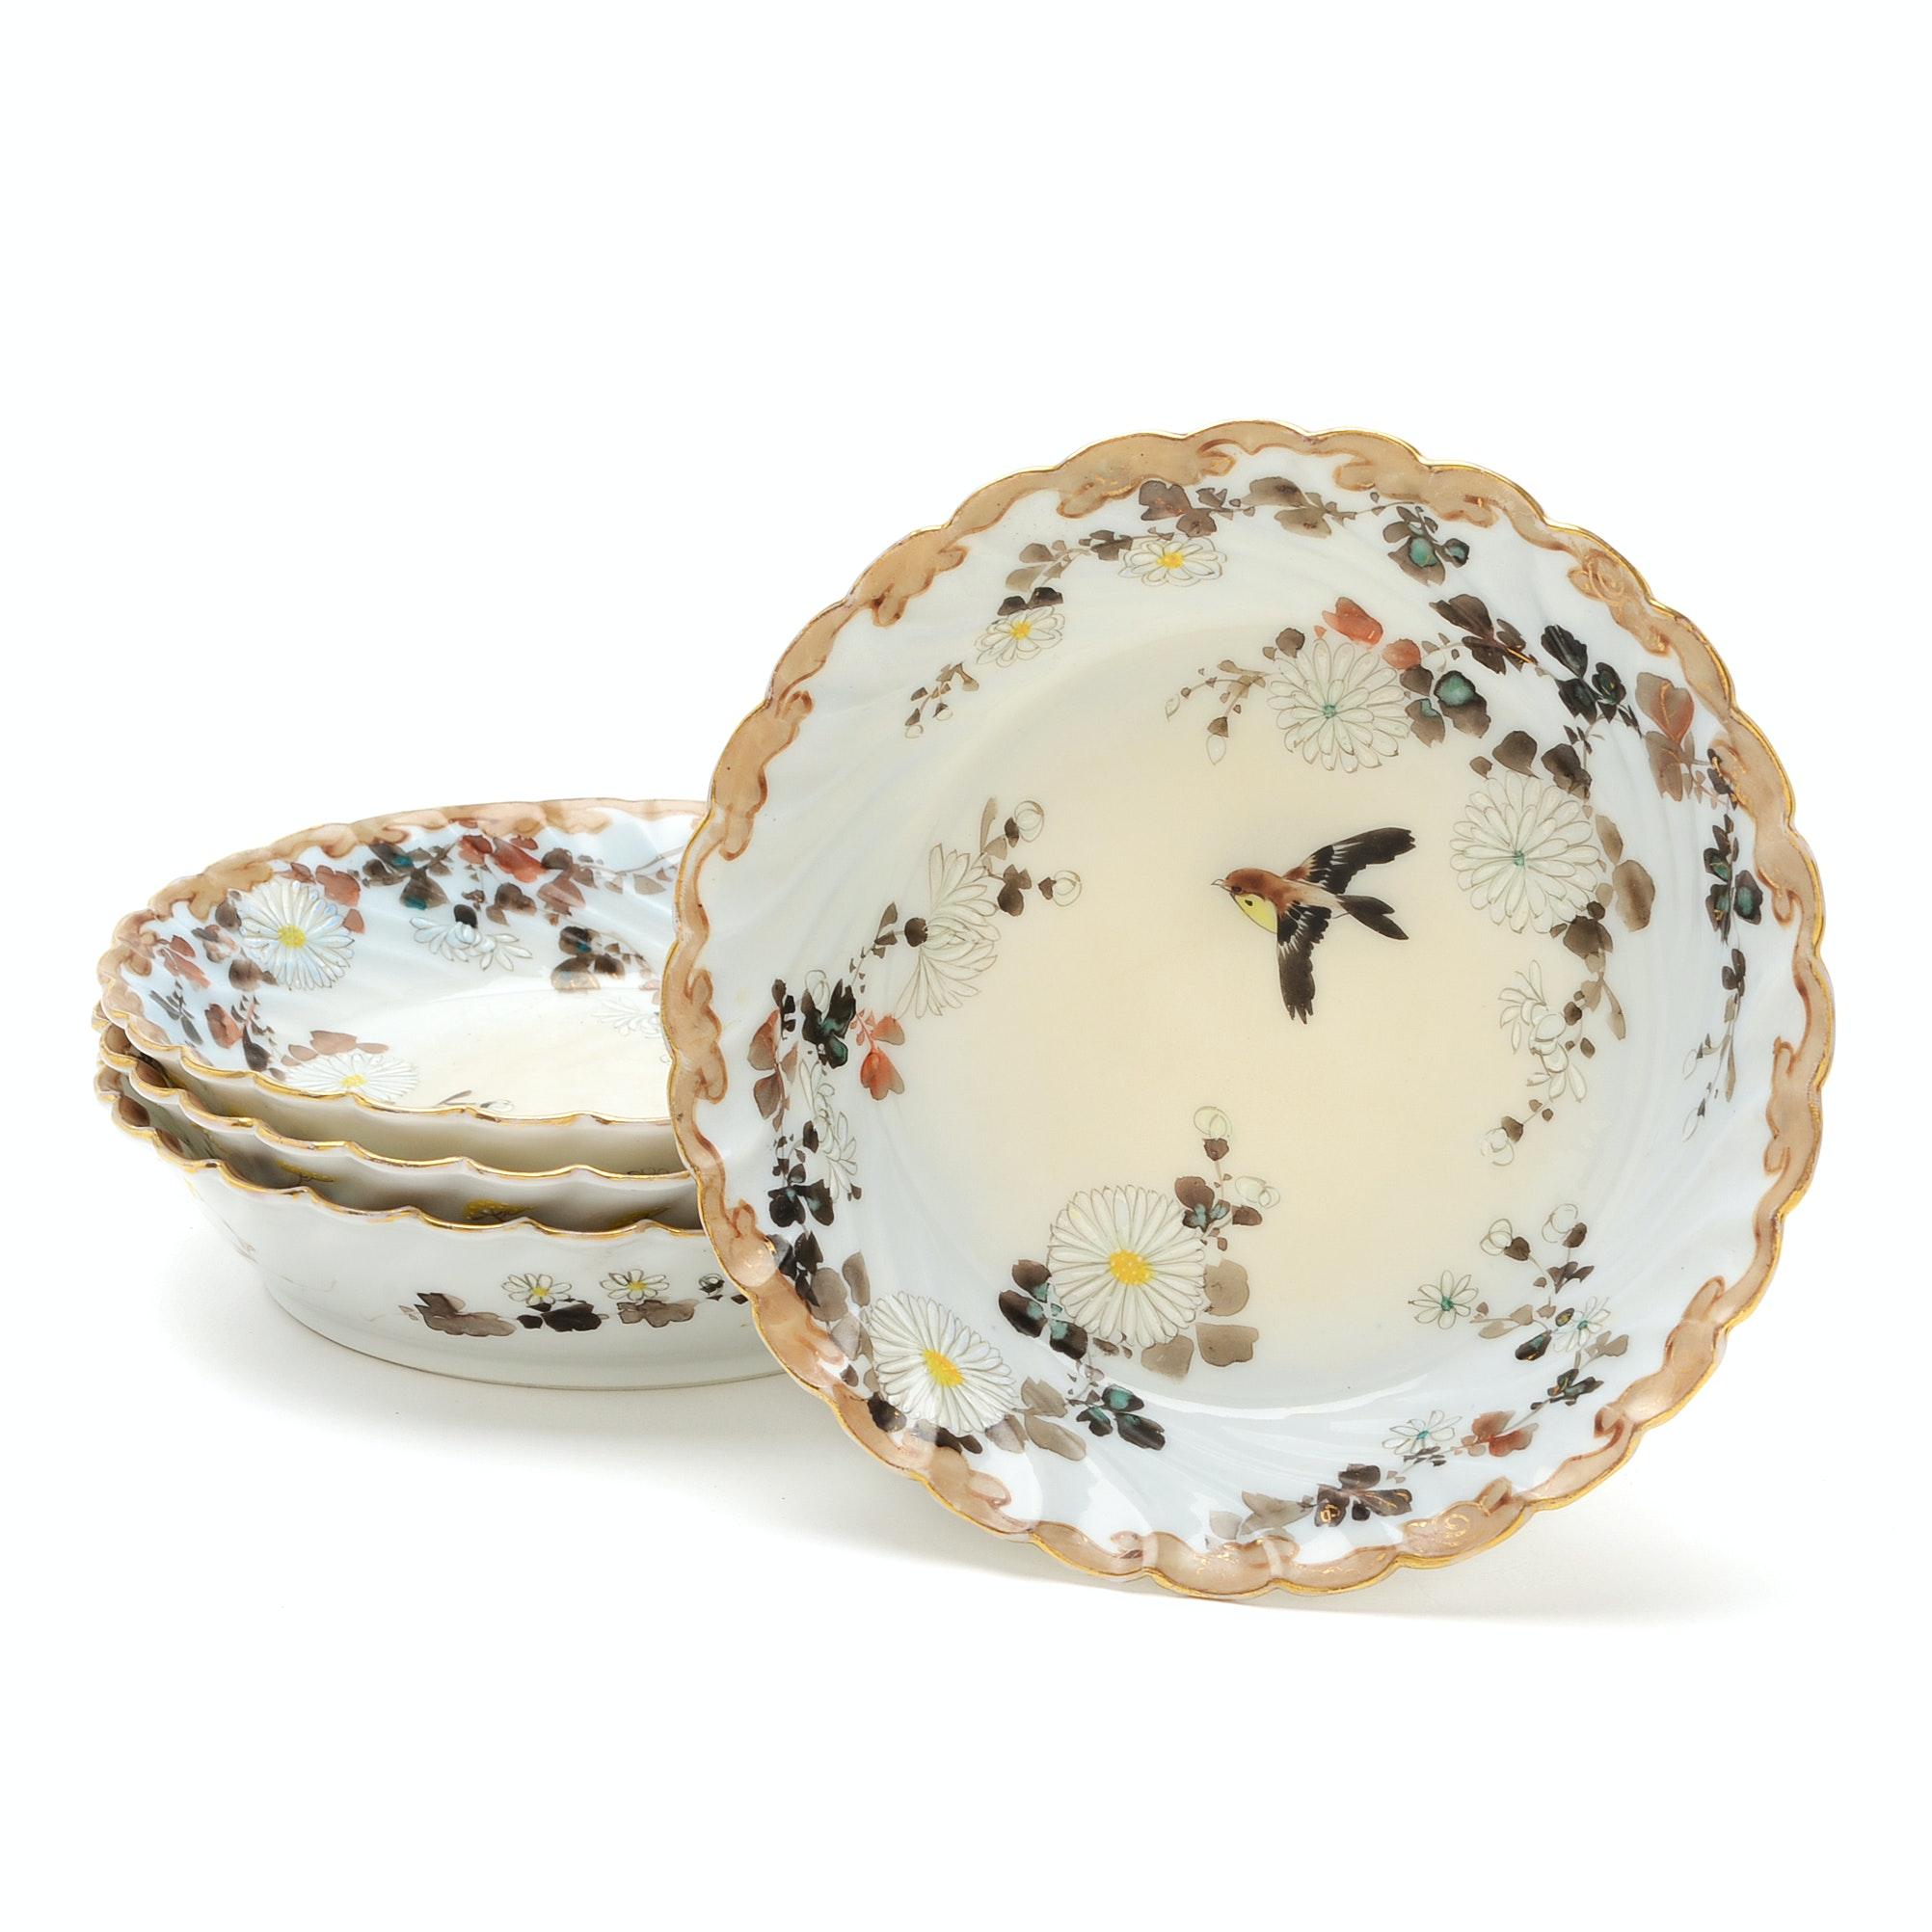 Set of Four Hand-Painted Porcelain Fruit Bowls